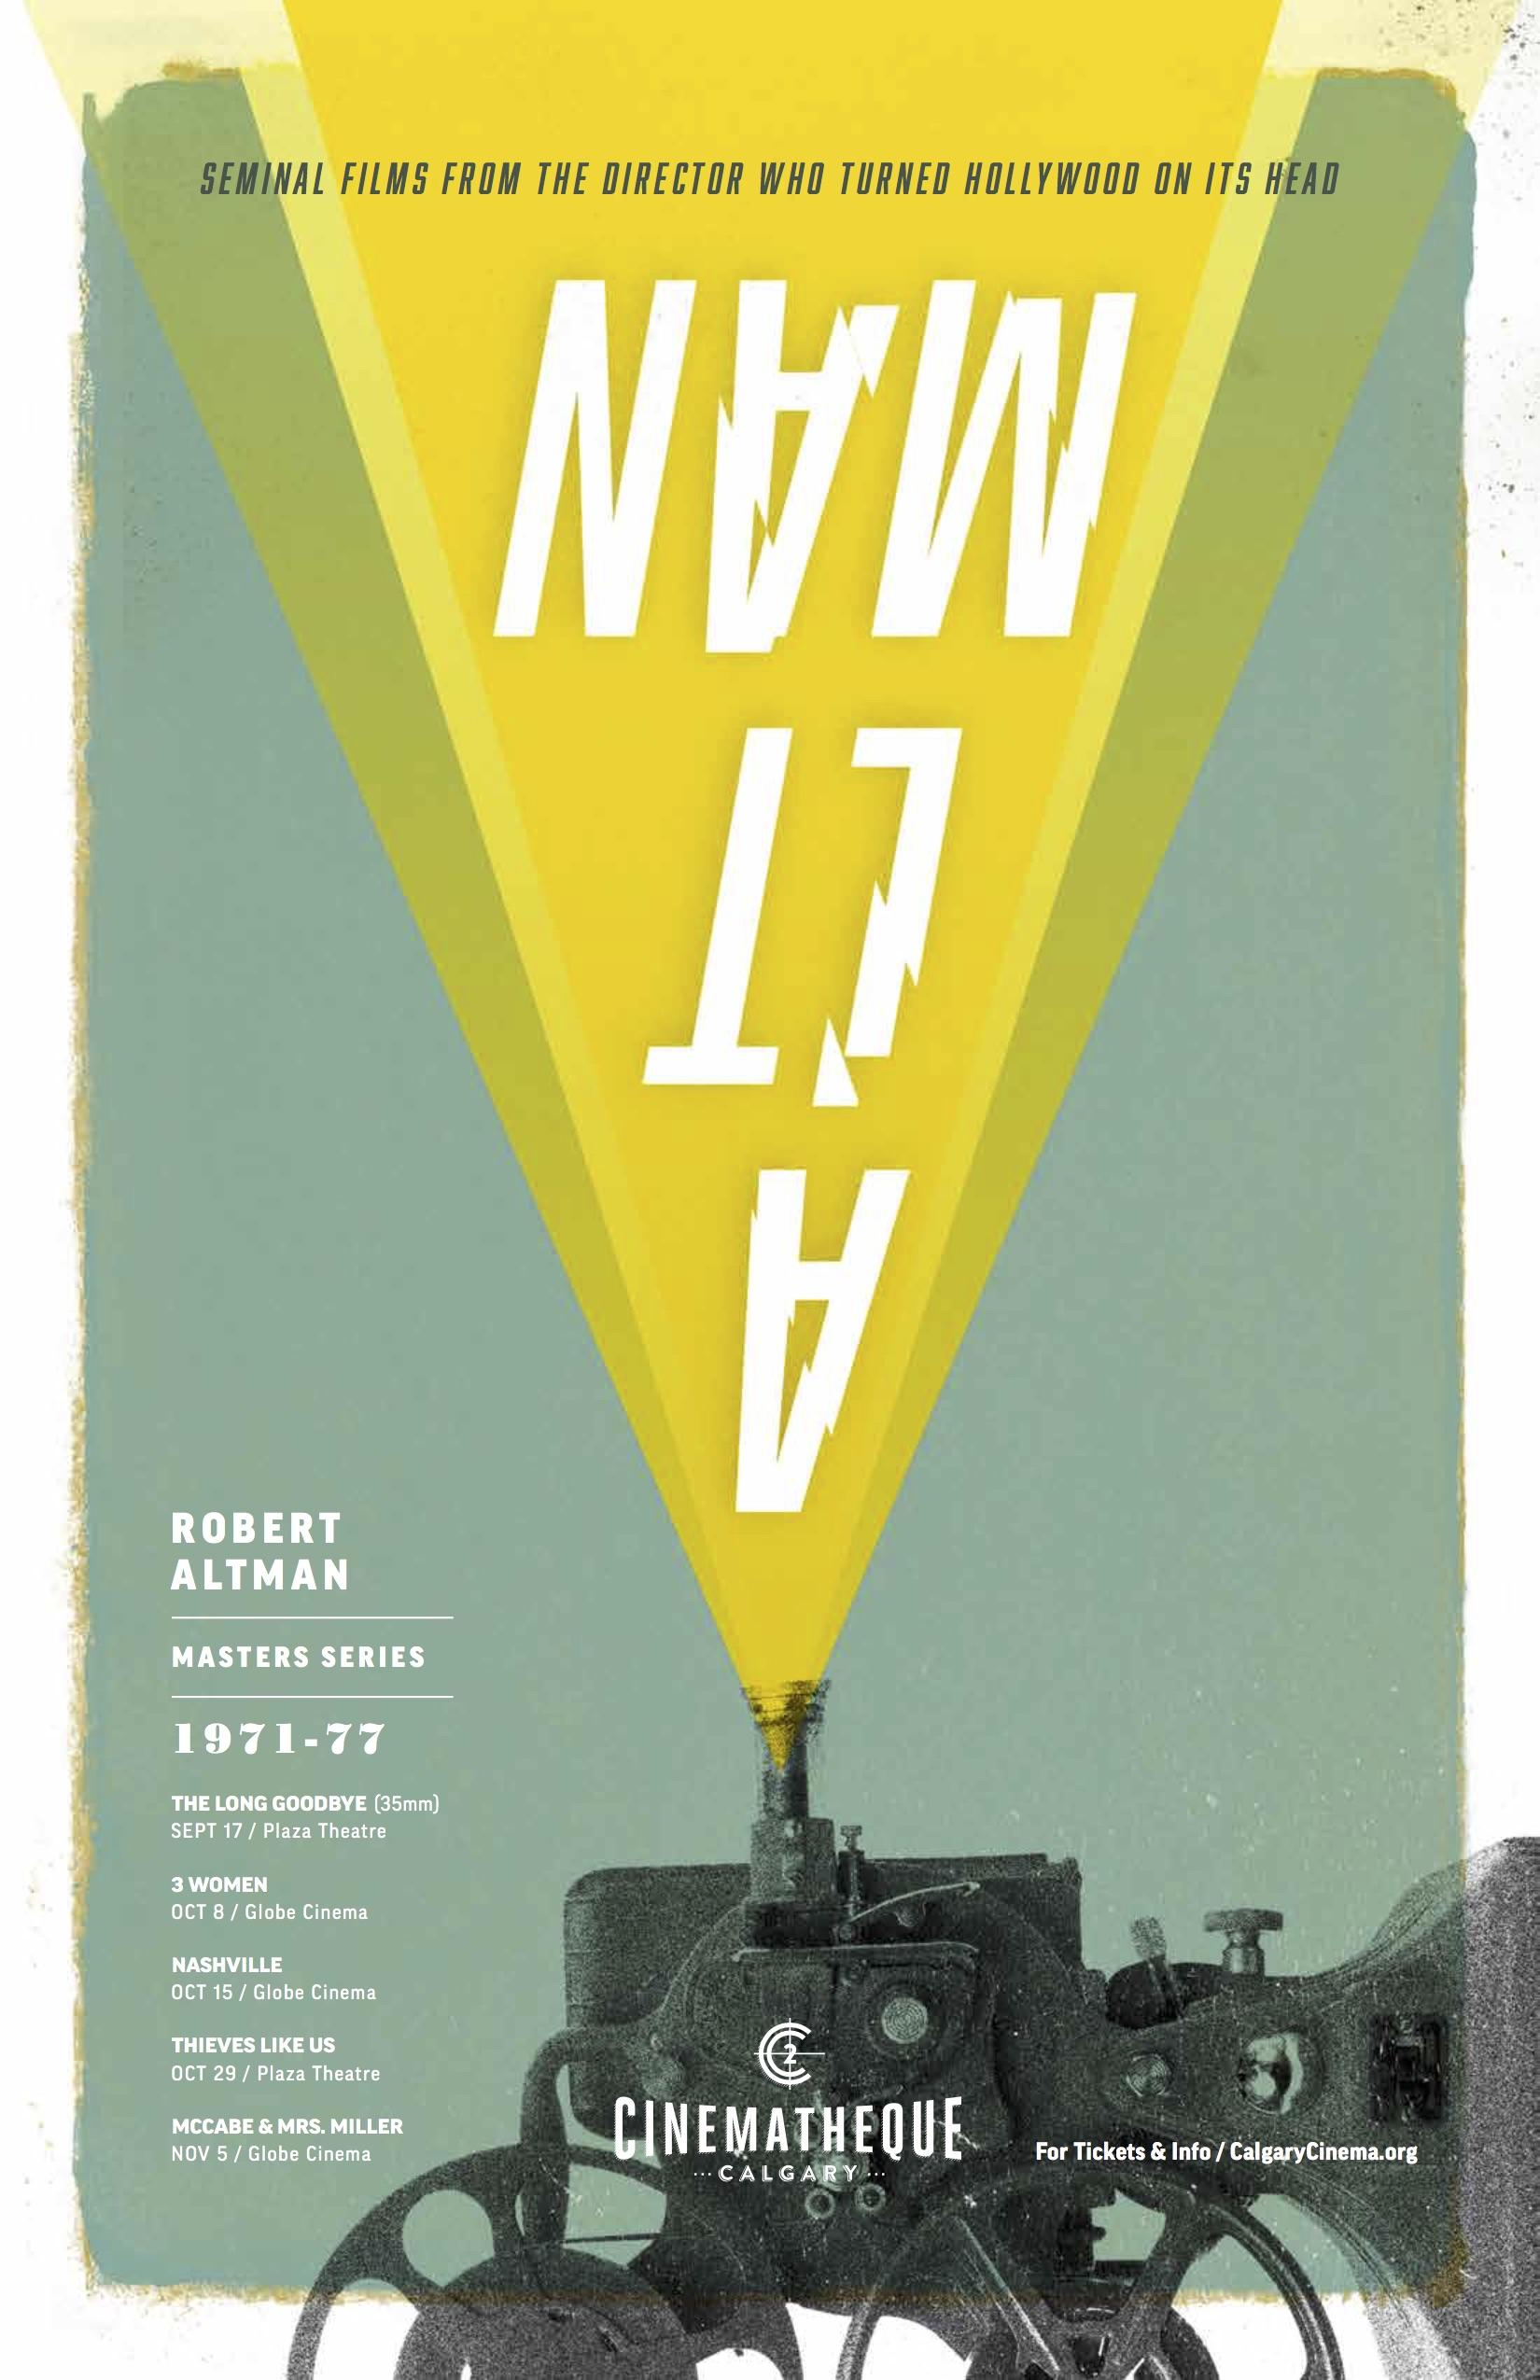 Robert Altman Master Series Calgary Cinematheque